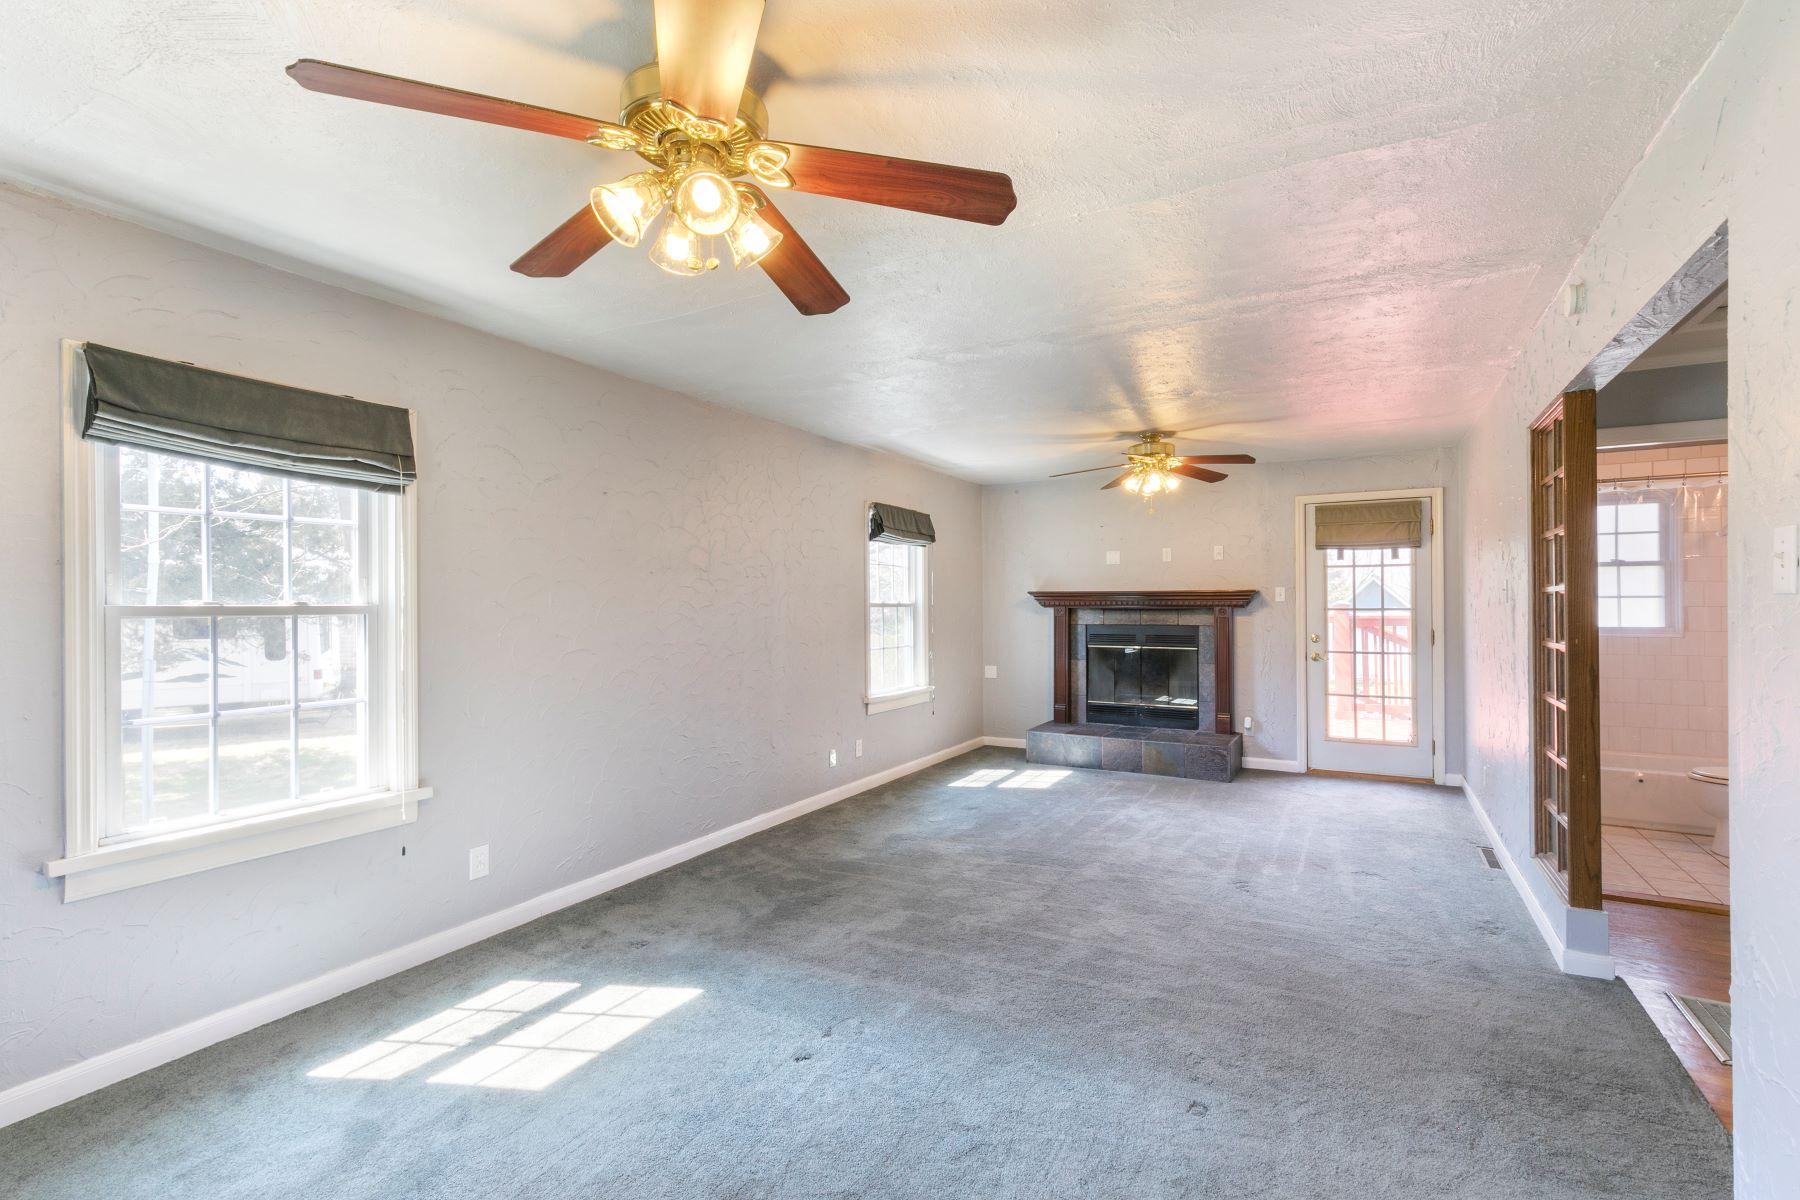 Additional photo for property listing at 3145 Lansing Drive, Saint Ann, MO 63074 3145 Lansing Drive St. Ann, Missouri 63074 United States